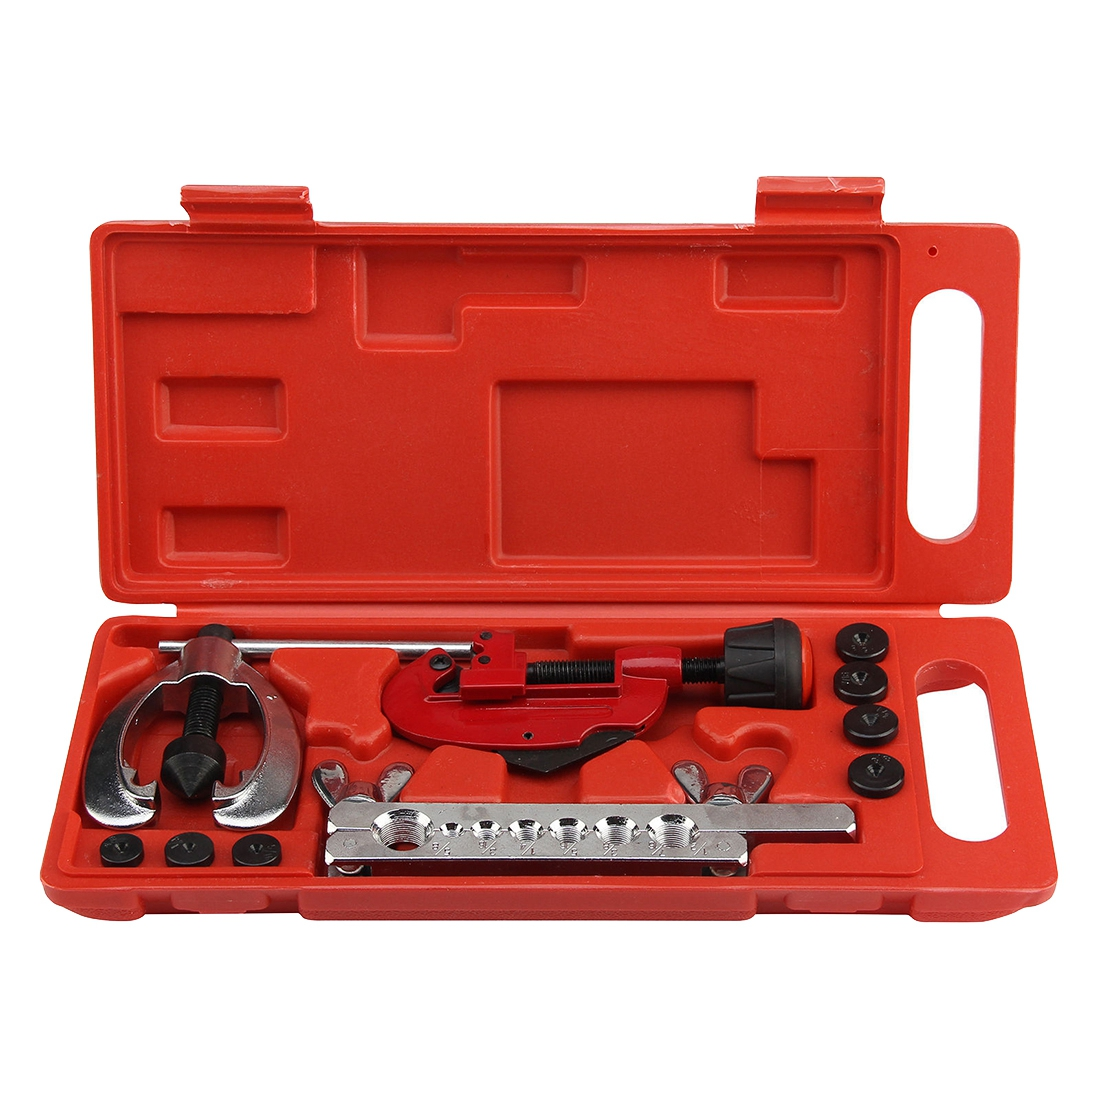 Image 5 - (Drop shipping) Copper Brake Fuel Pipe Repair Double Flaring Dies Tool Set Clamp Kit Tube Cutter For Cutting And Flaring CopperHand Tool Sets   -